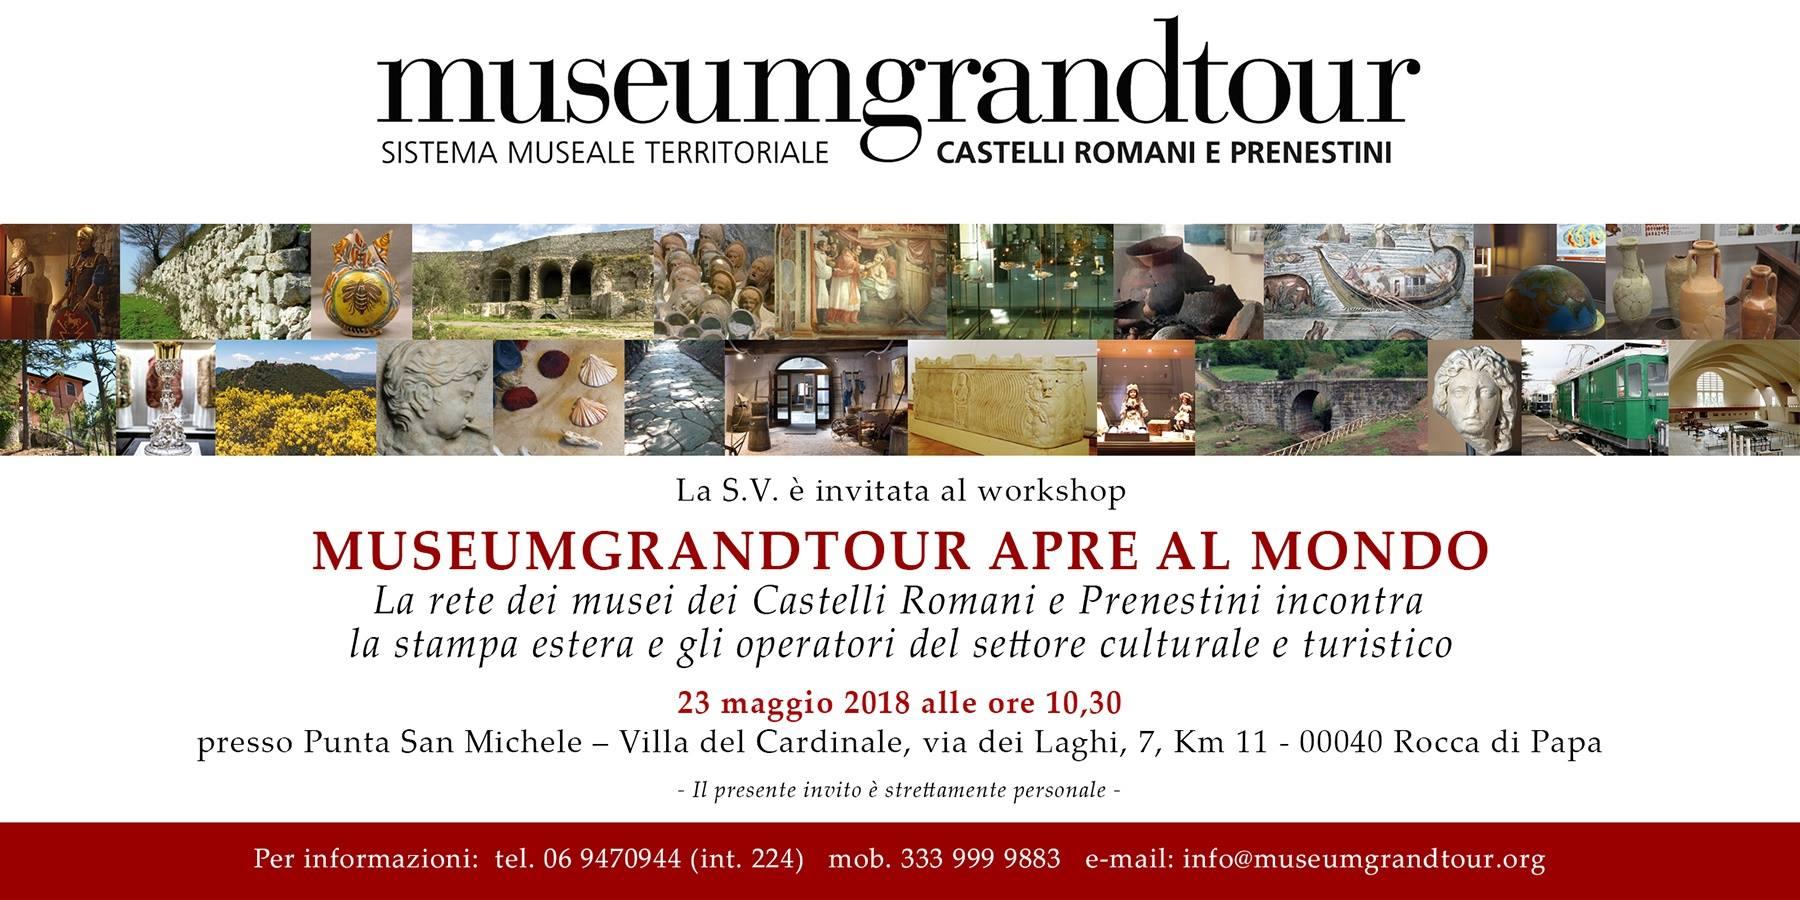 MUSEUMGRANDTOUR APRE AL MONDO